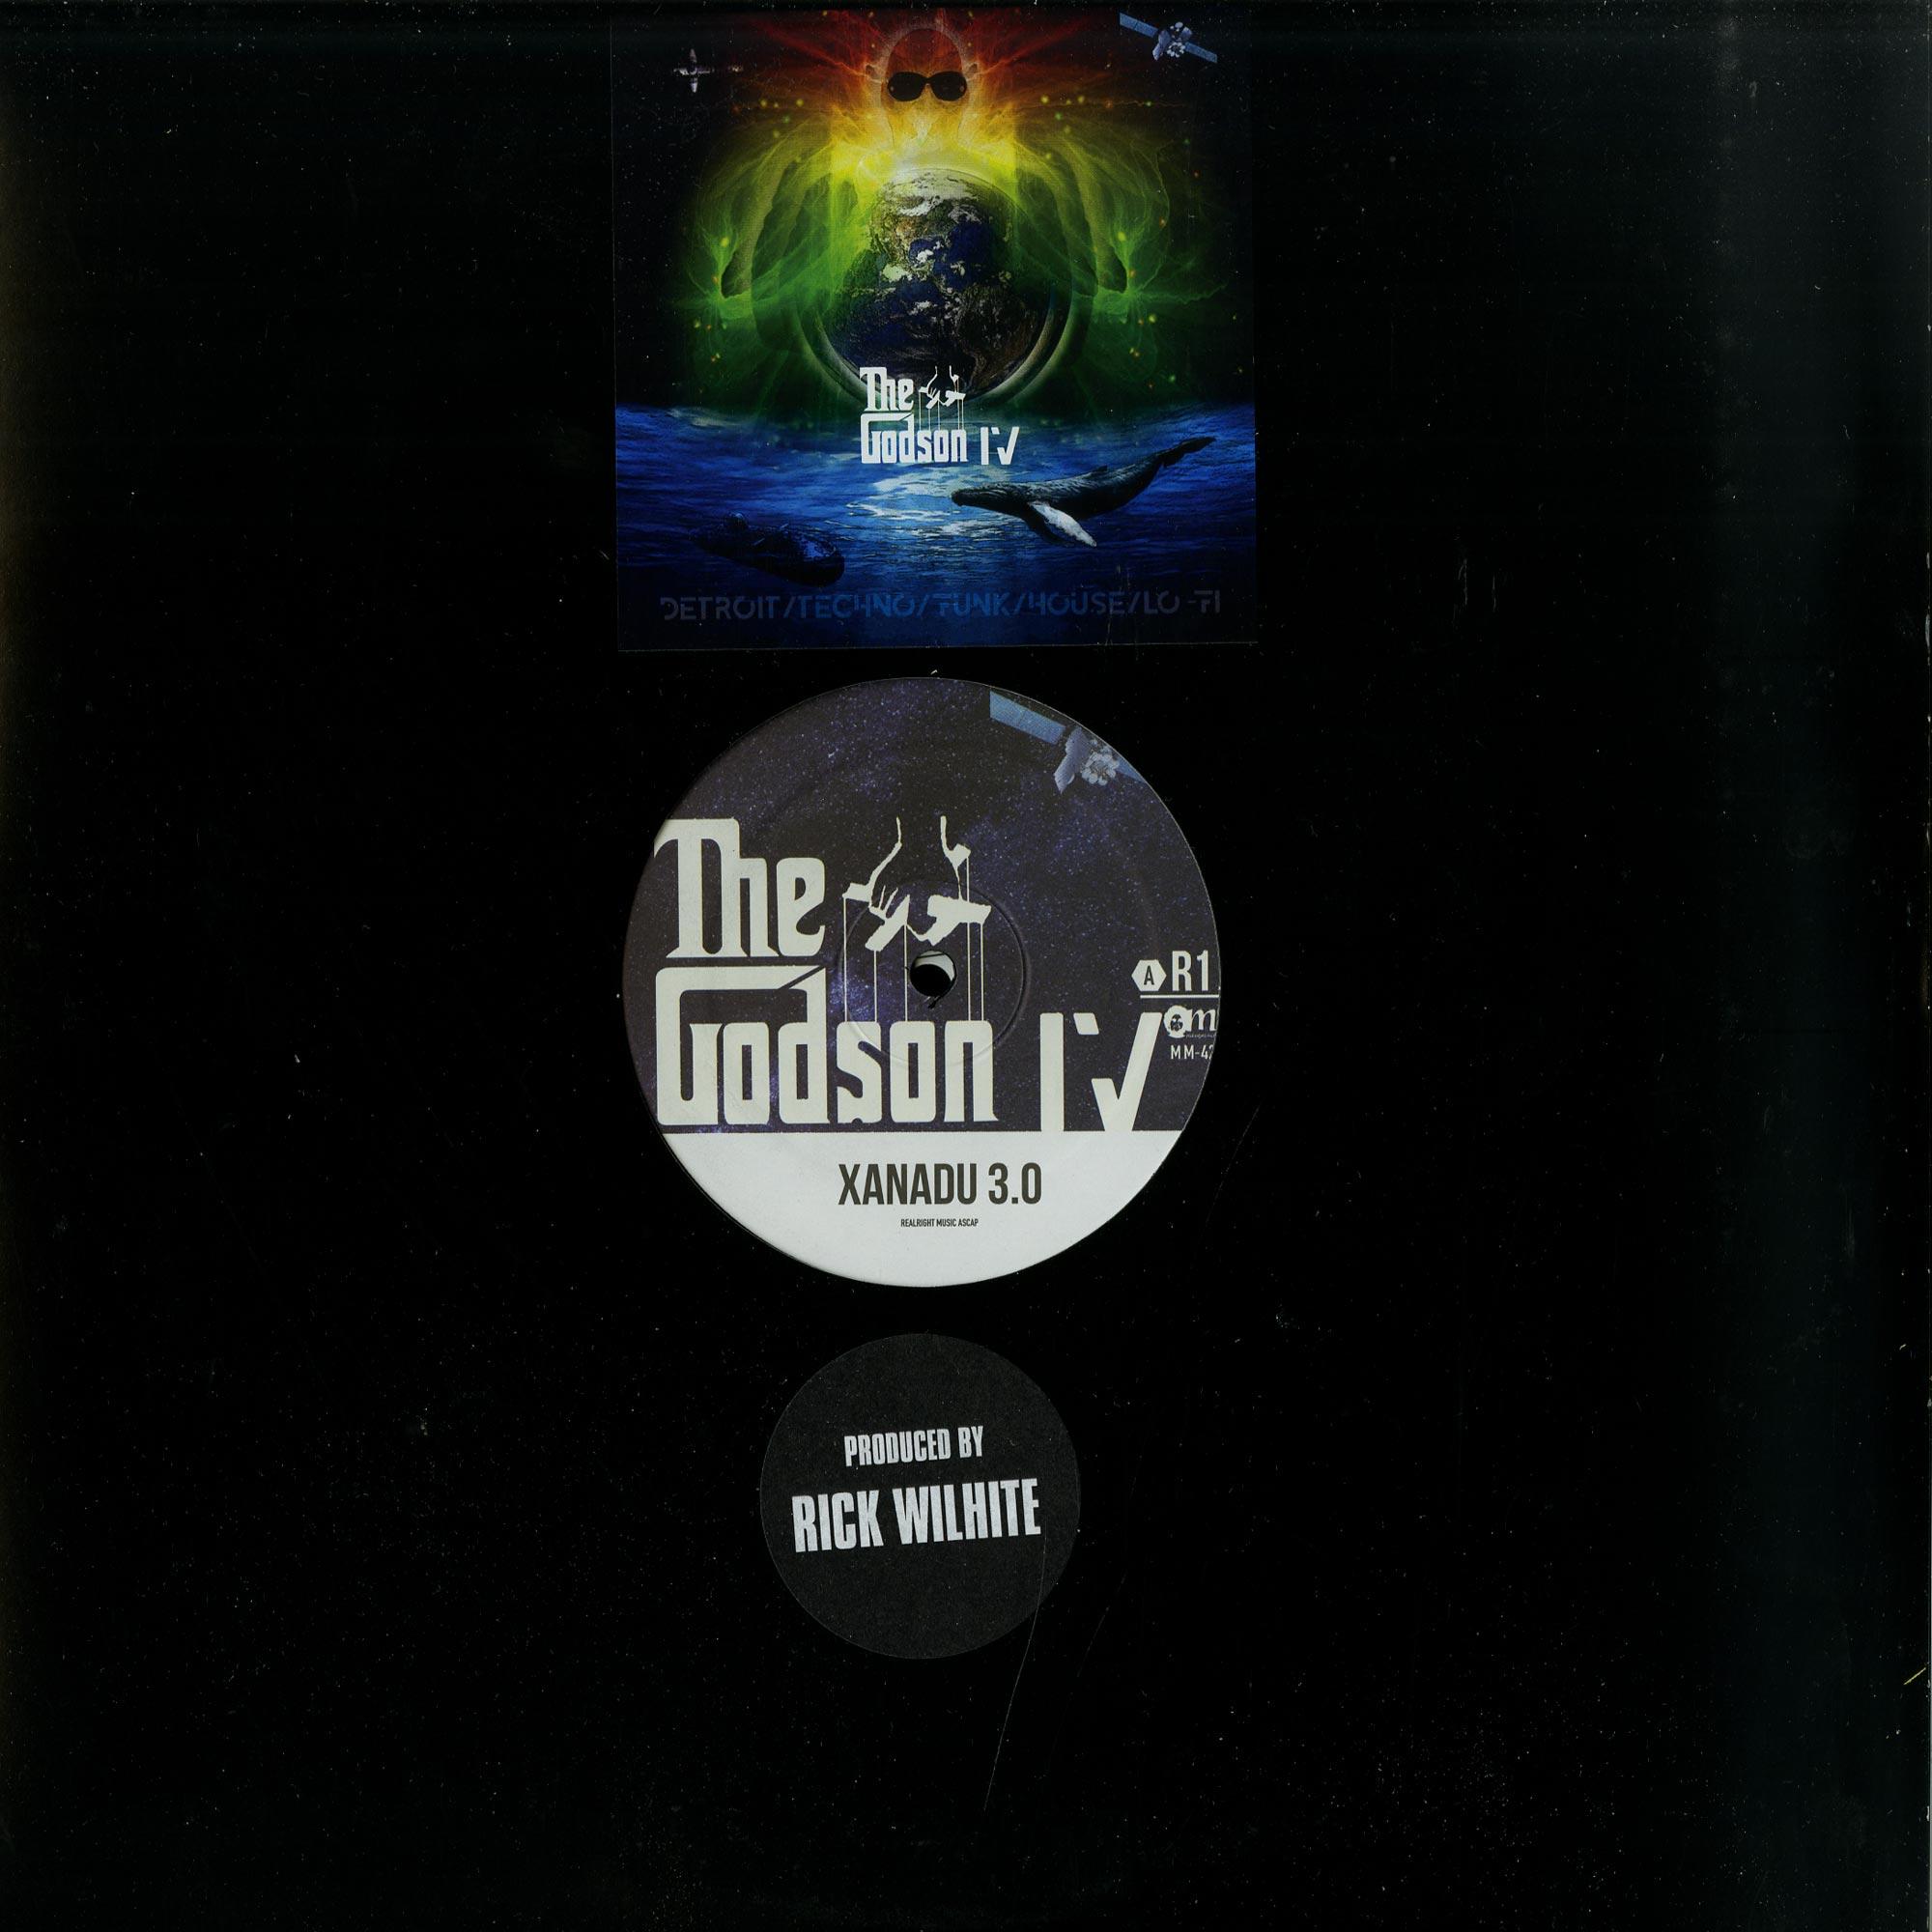 Rick Wilhite - THE GODSON IV